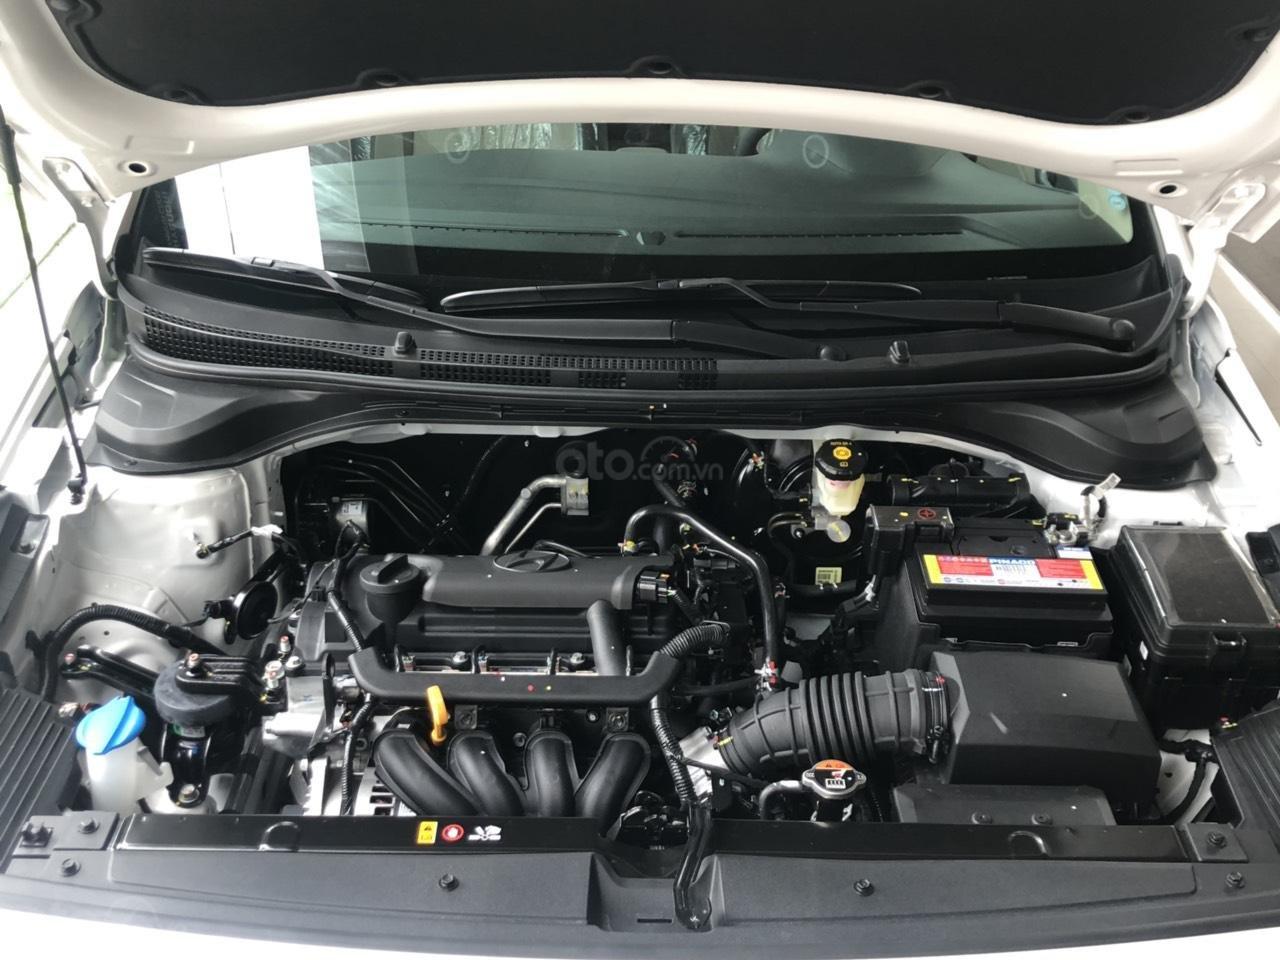 Bán Hyundai Accent 2019 - Giá tốt - xe sẵn - Bank bao đậu (17)